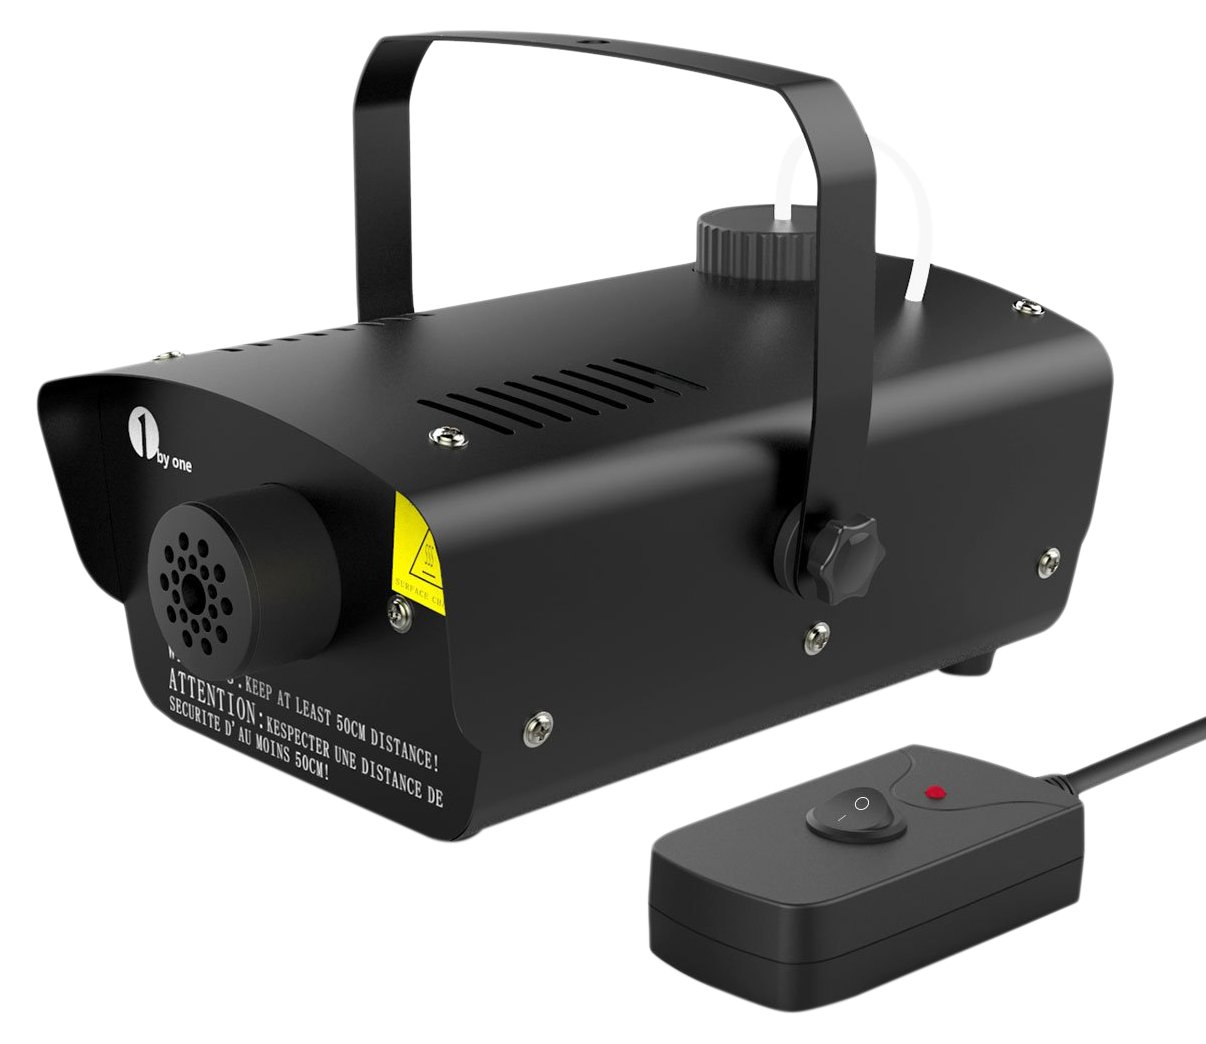 Halloween Fogger an error occurred Amazoncom 1byone Halloween Fog Machine With Wired Remote Control 400 Watt Fog Machine Black Musical Instruments